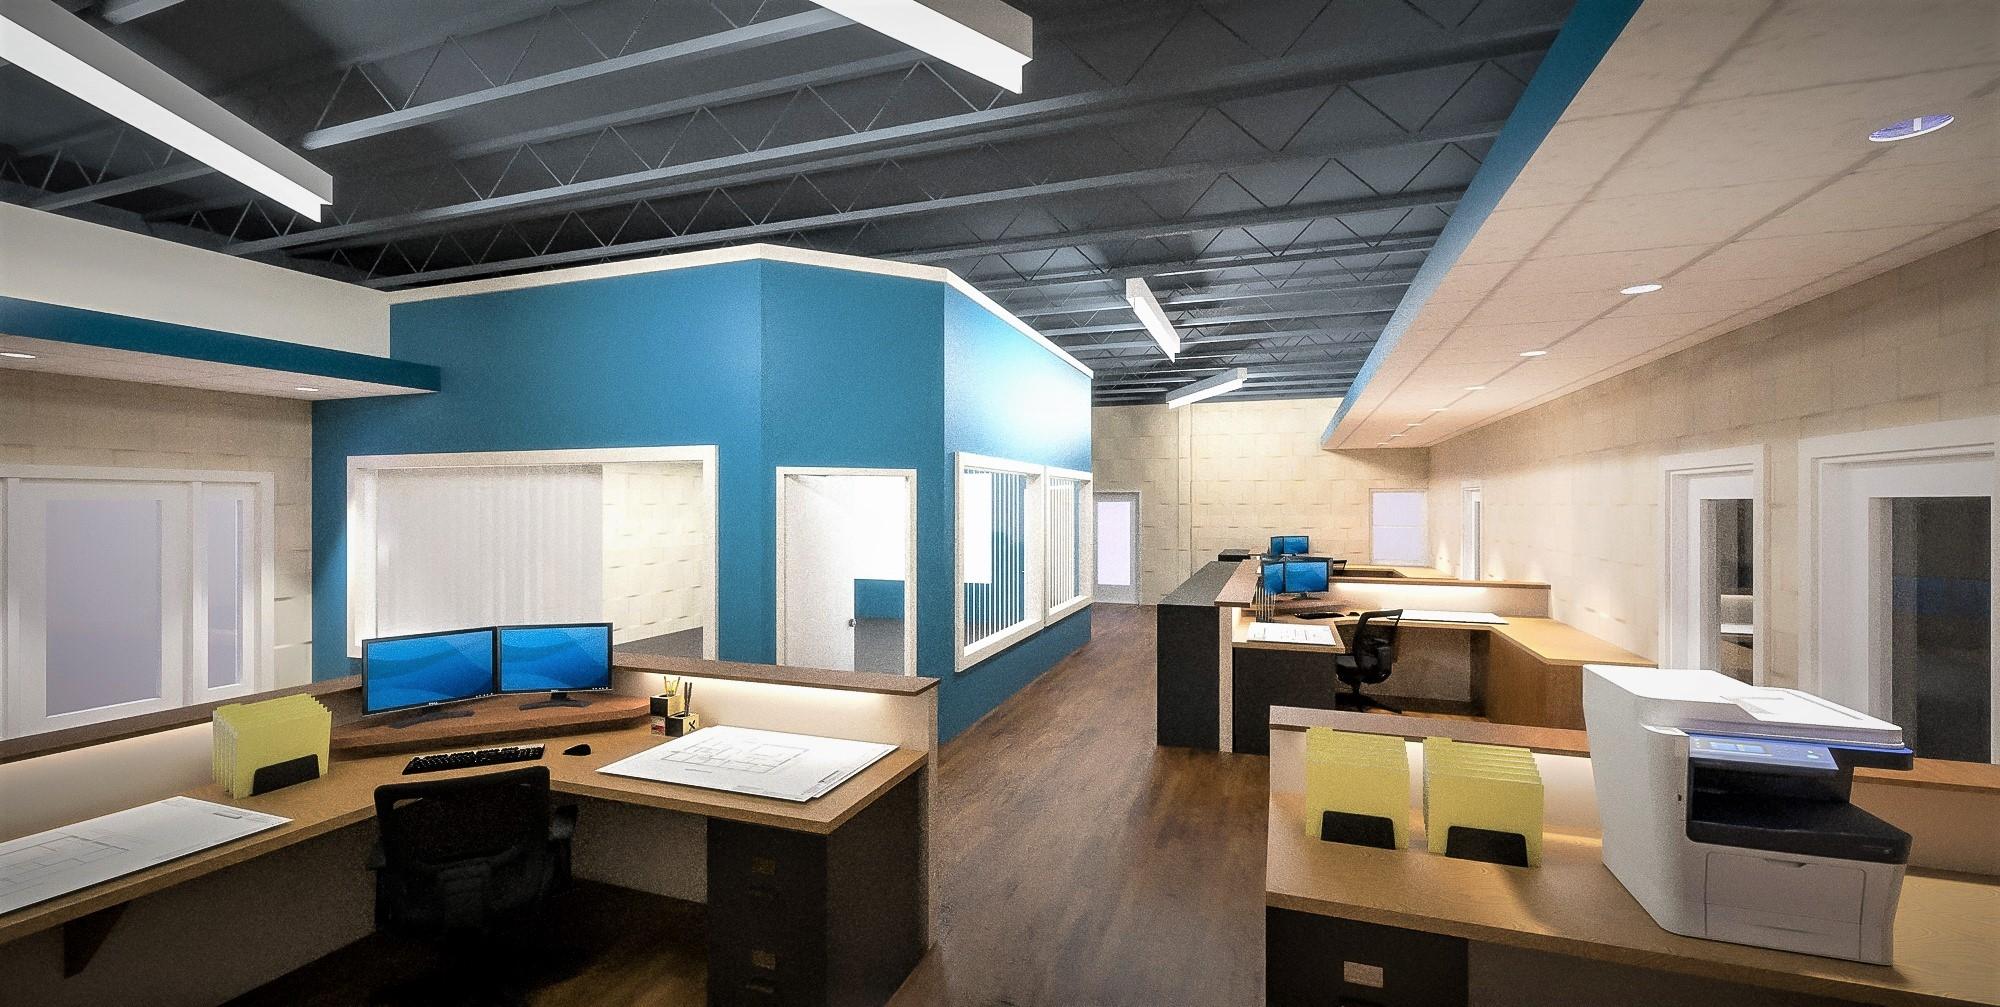 Interior Office Rendering